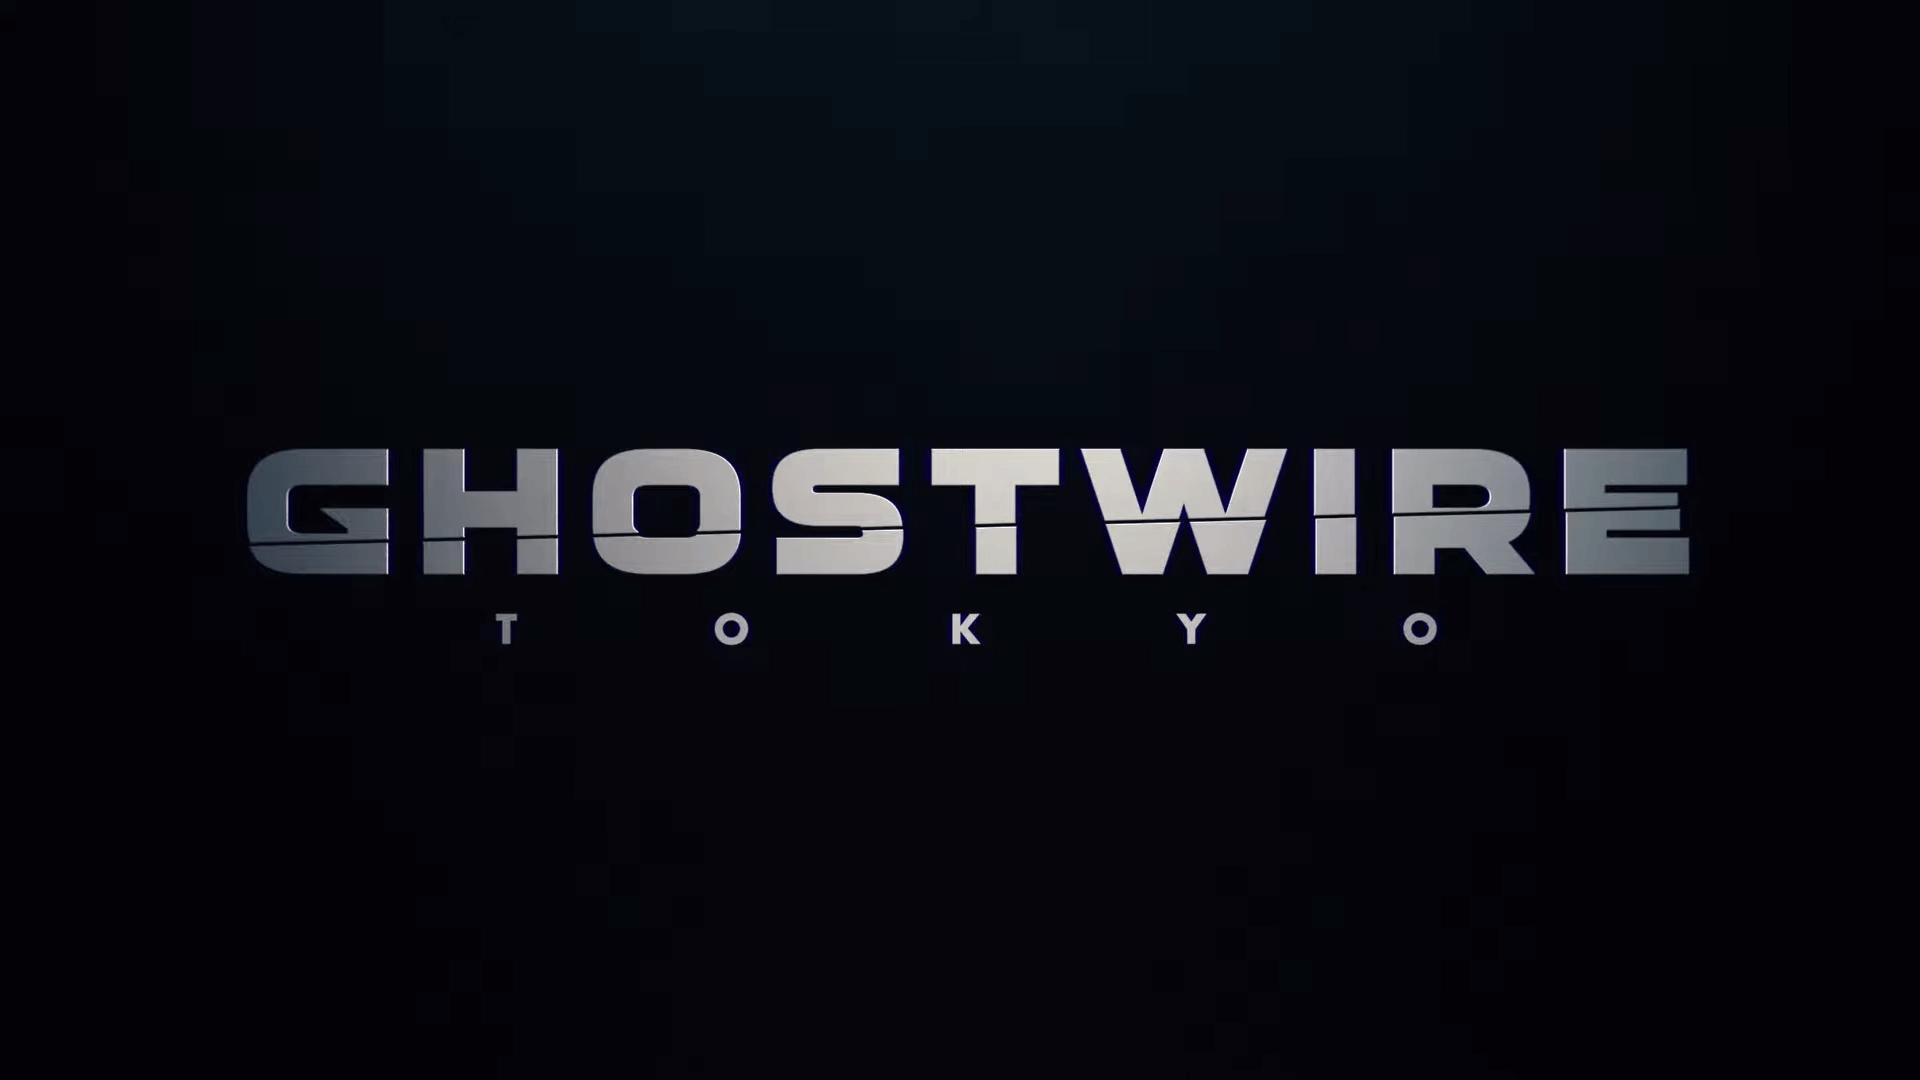 ghostwire tokyo logo wallpaper 72310